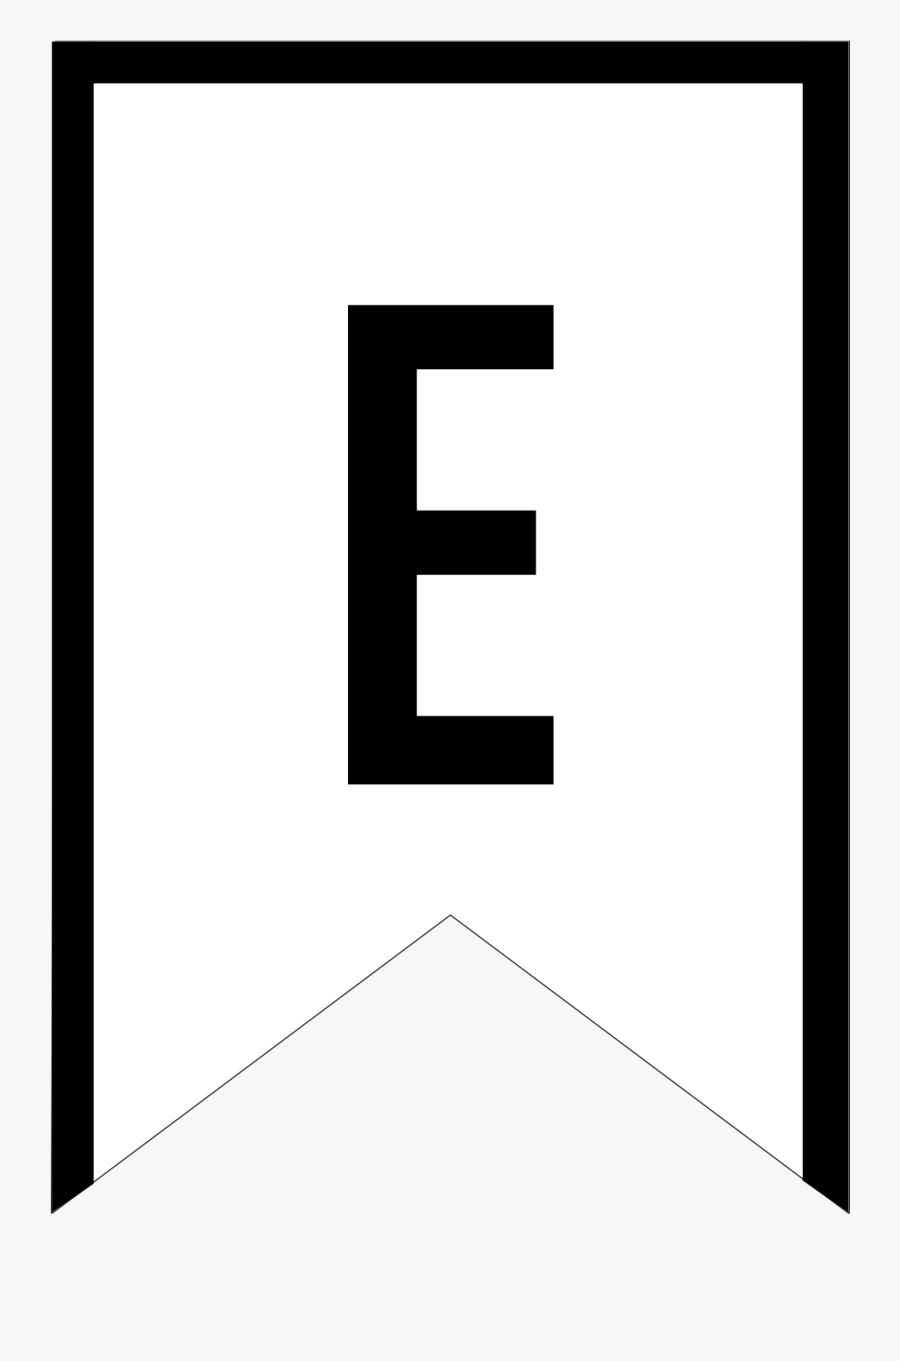 Printable Free Printable Clipart Alphabet Letters, Transparent Clipart